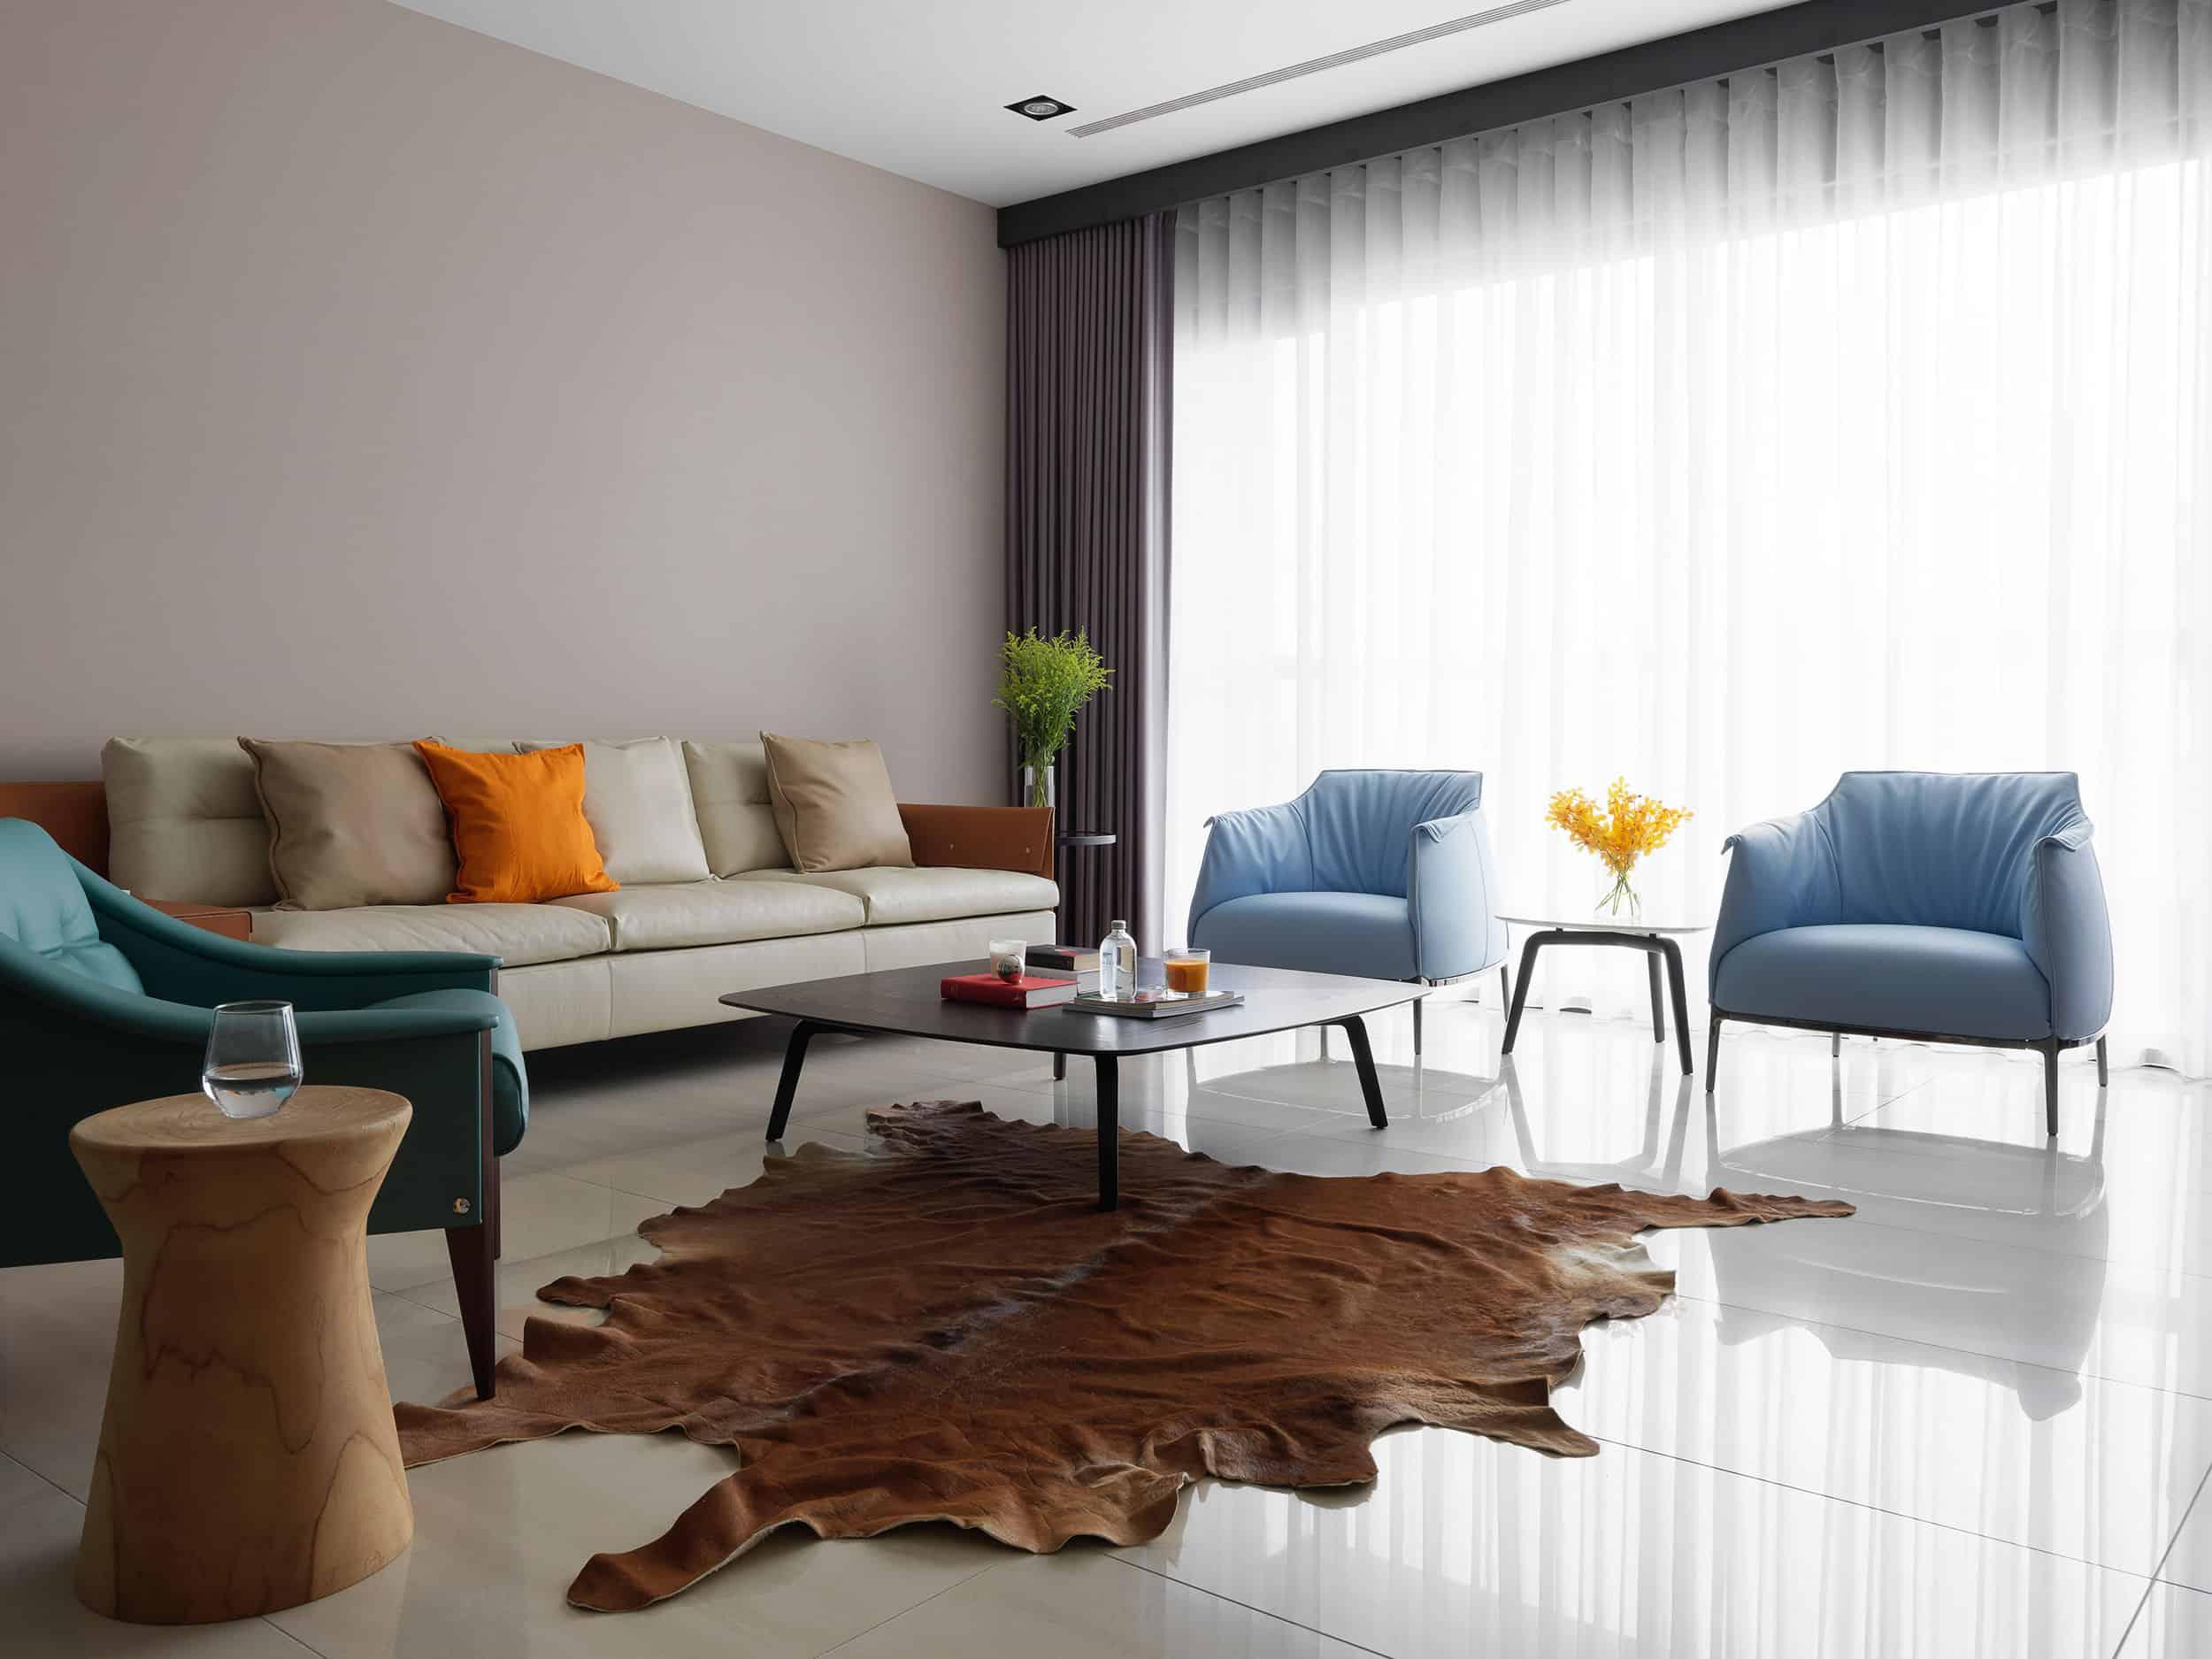 Apartment-from-Summer-Samson-03